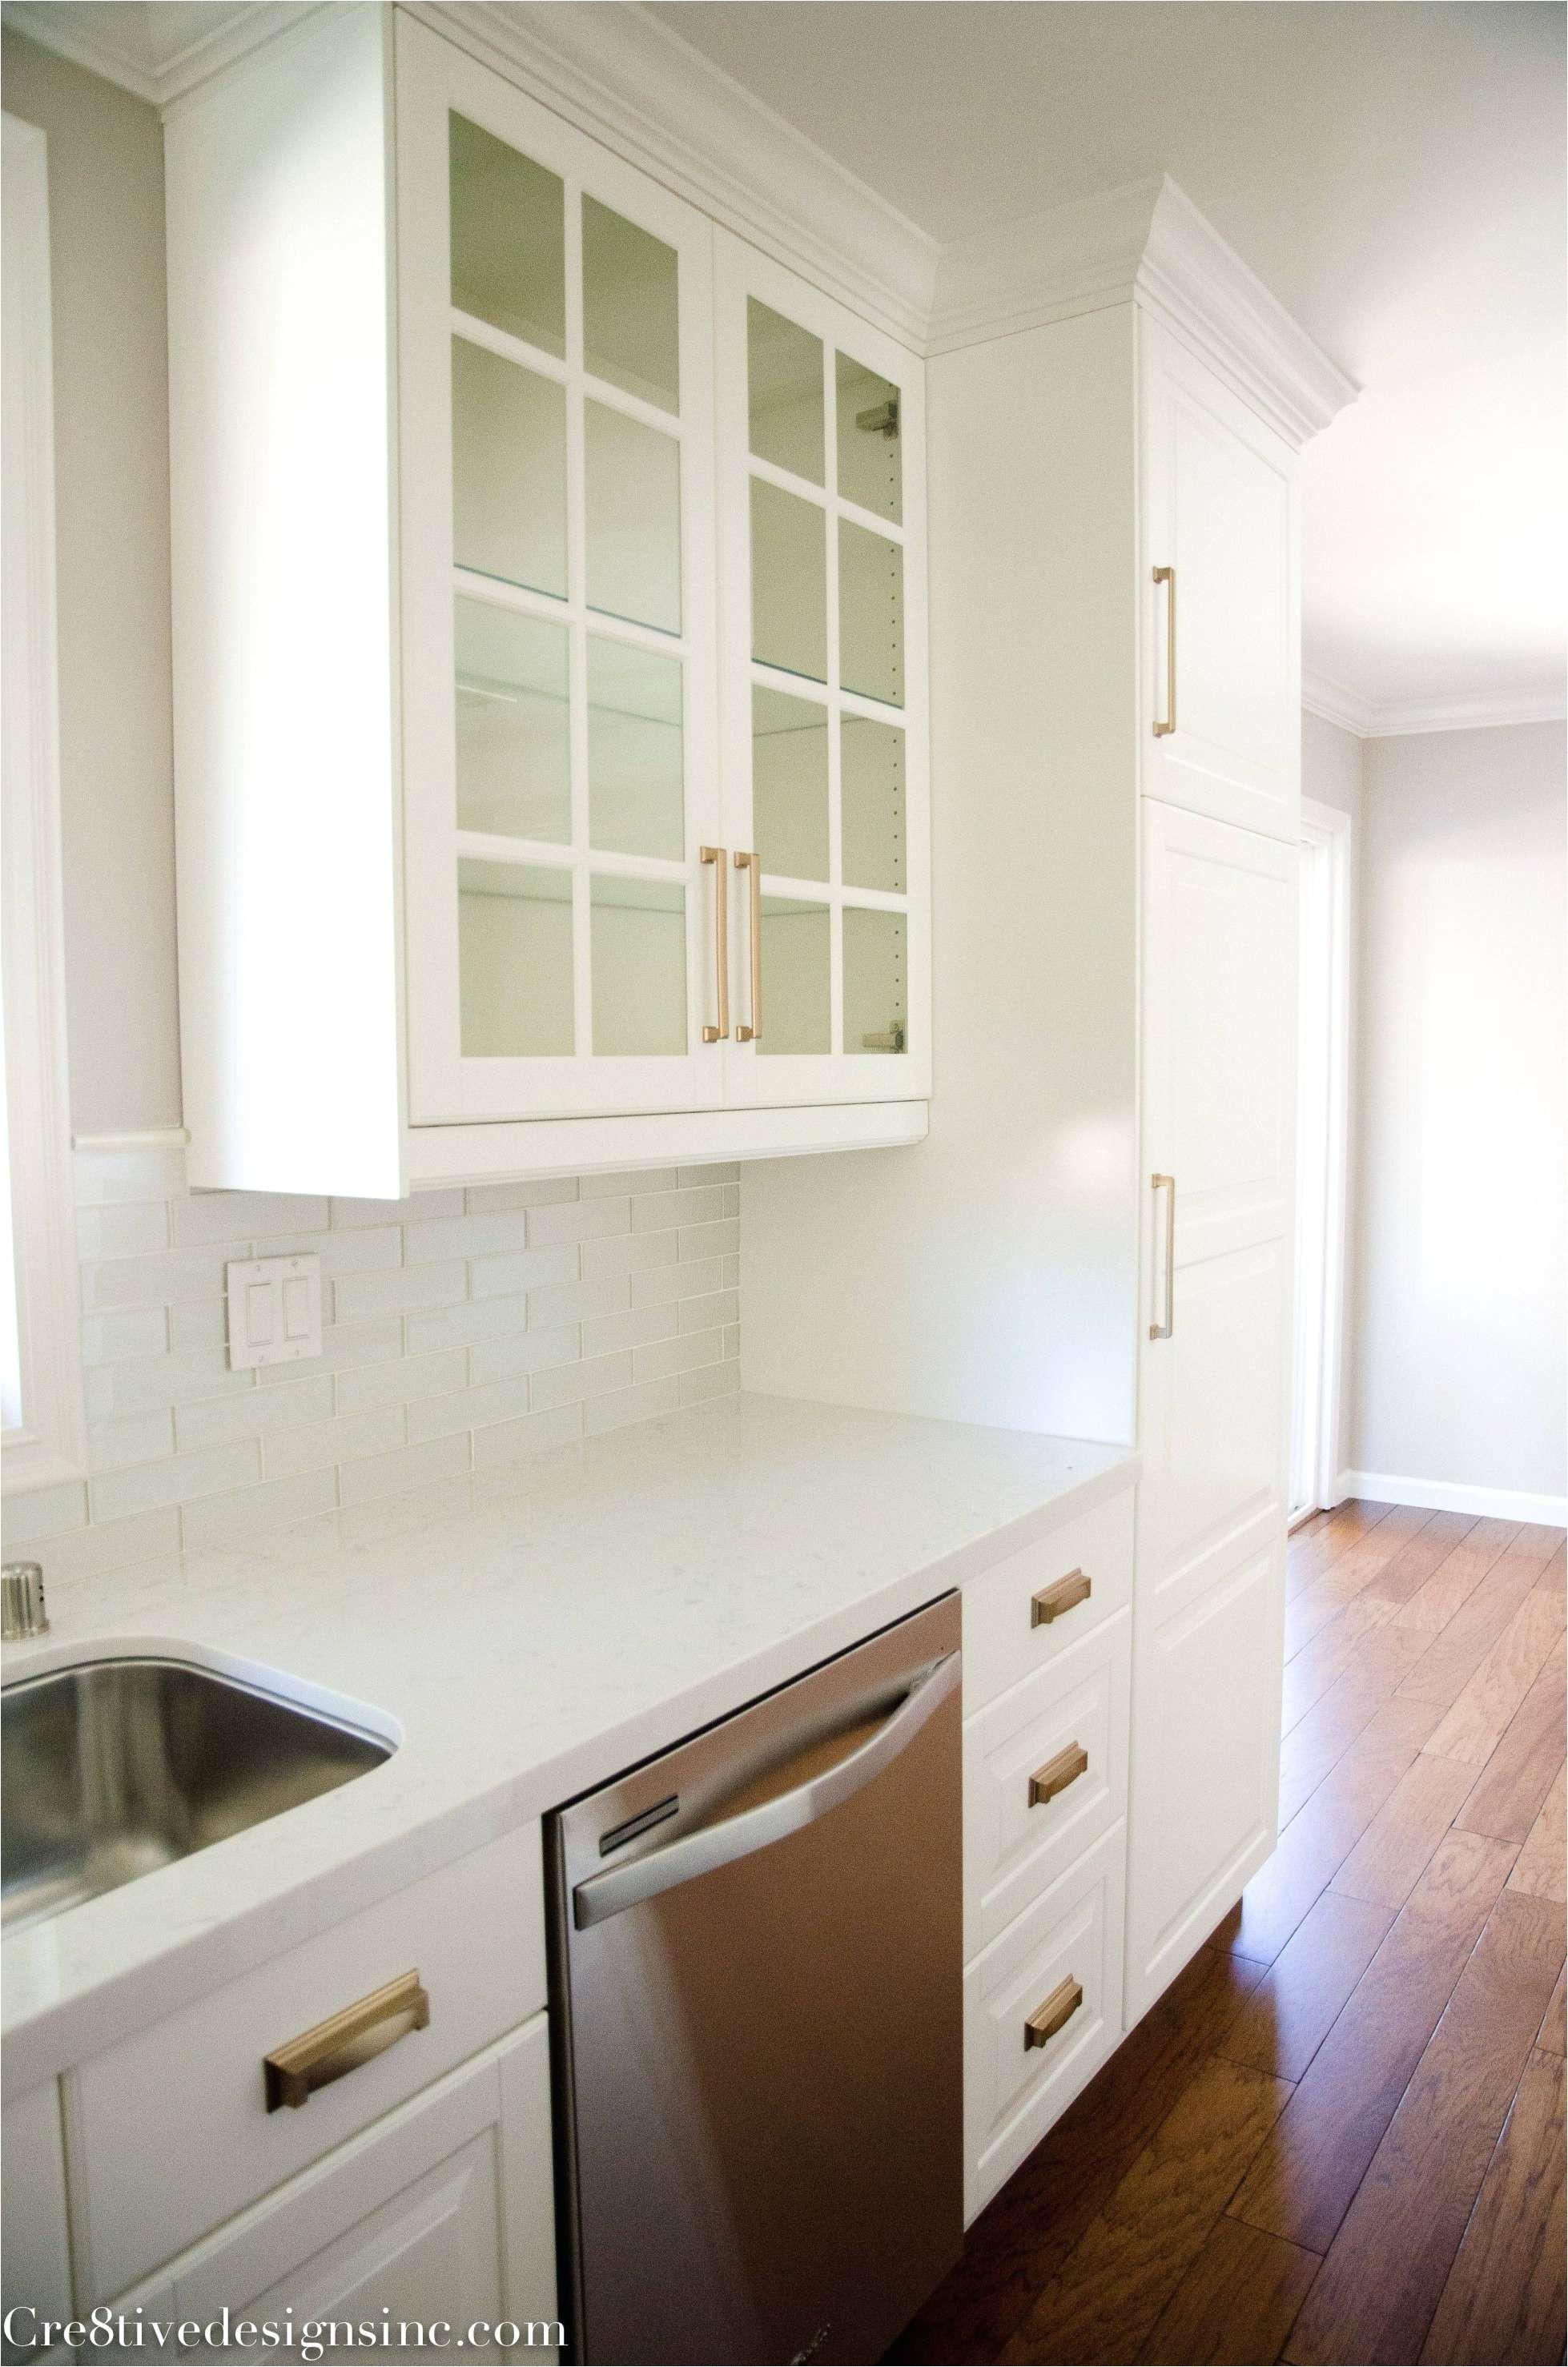 Kitchen Design s Special Samples Kitchen Cabinet Doors Awesome Kitchen Design 0d Design